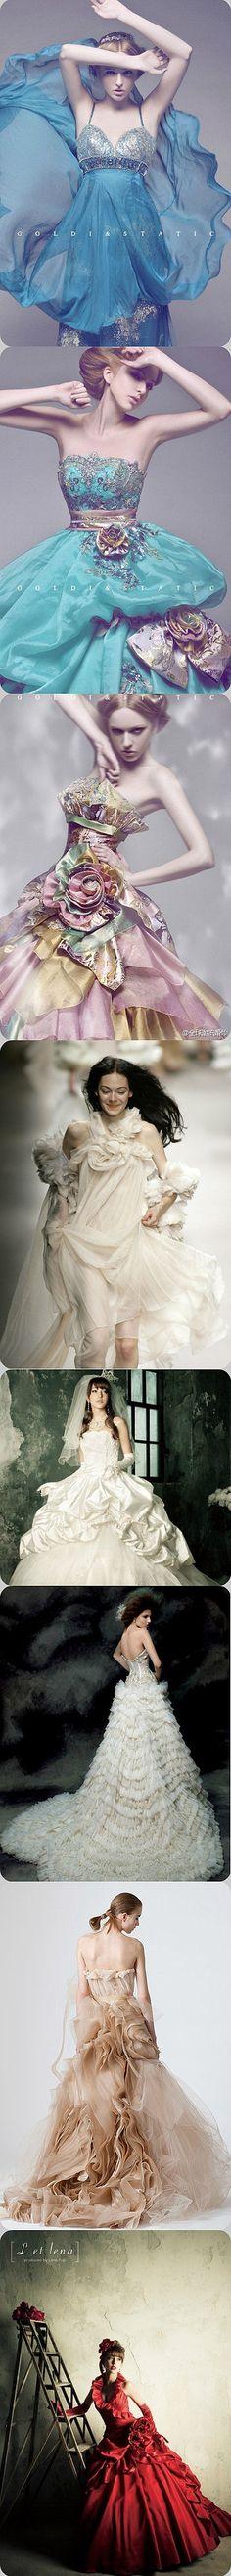 beautifull wedding dresses